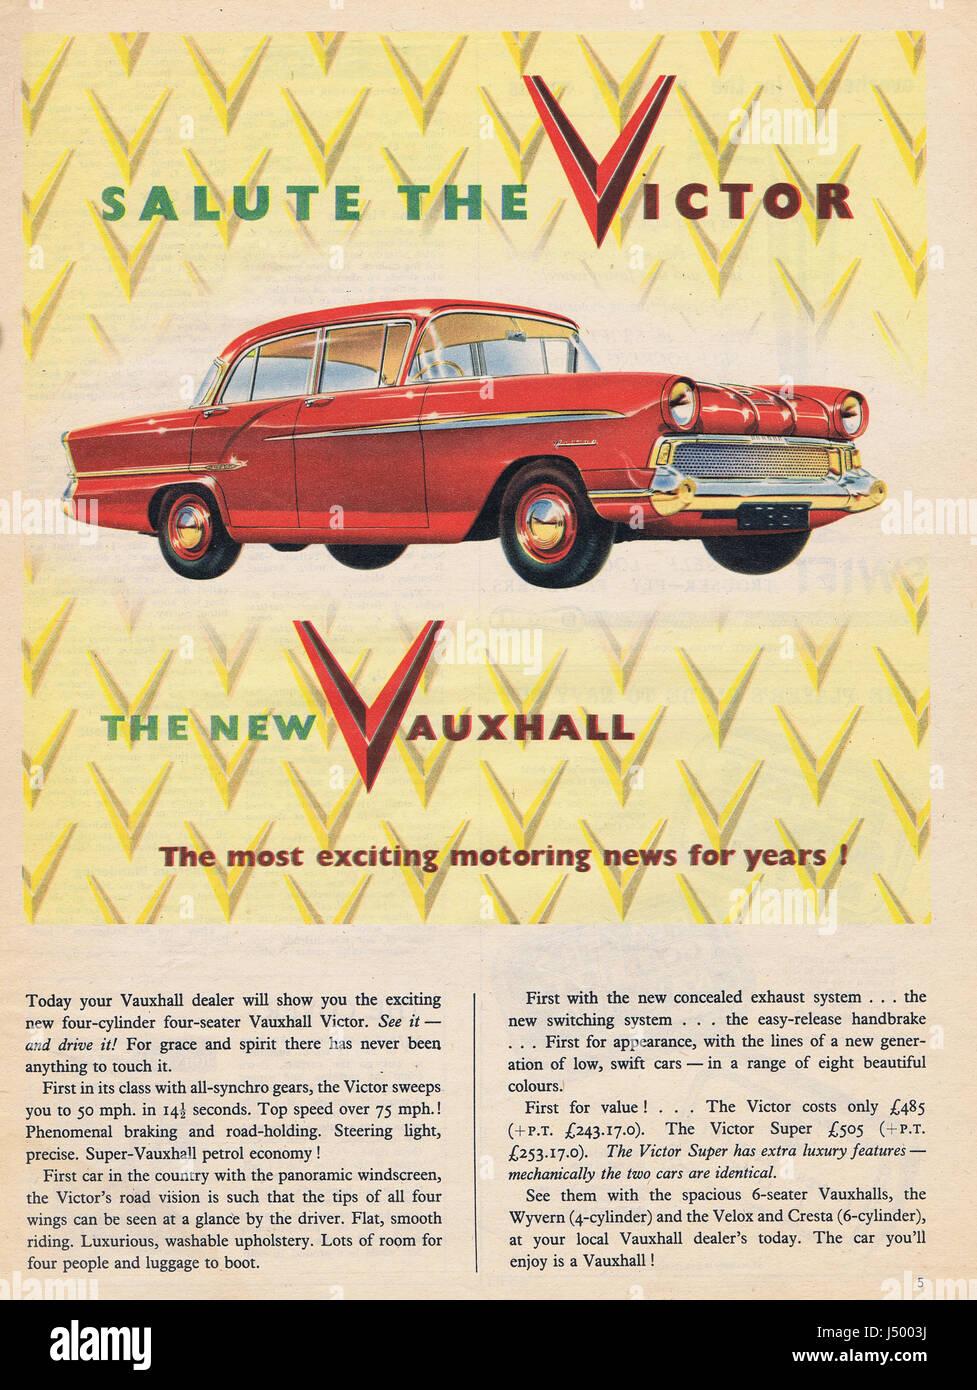 Vauxhall Victor Motor Car Advert 1950's - Stock Image